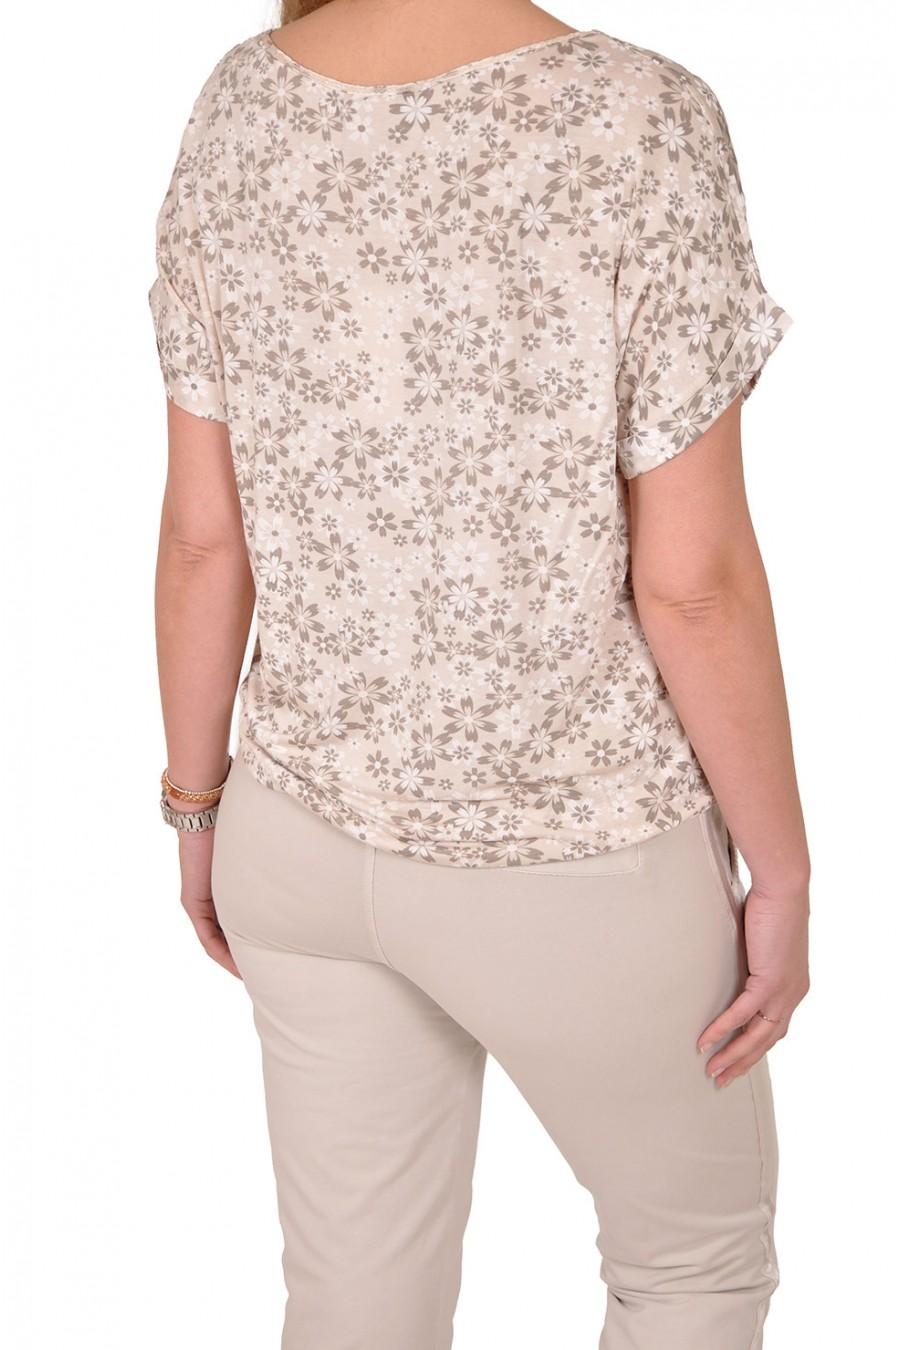 Silk touch top bloem beige Gemma Ricceri